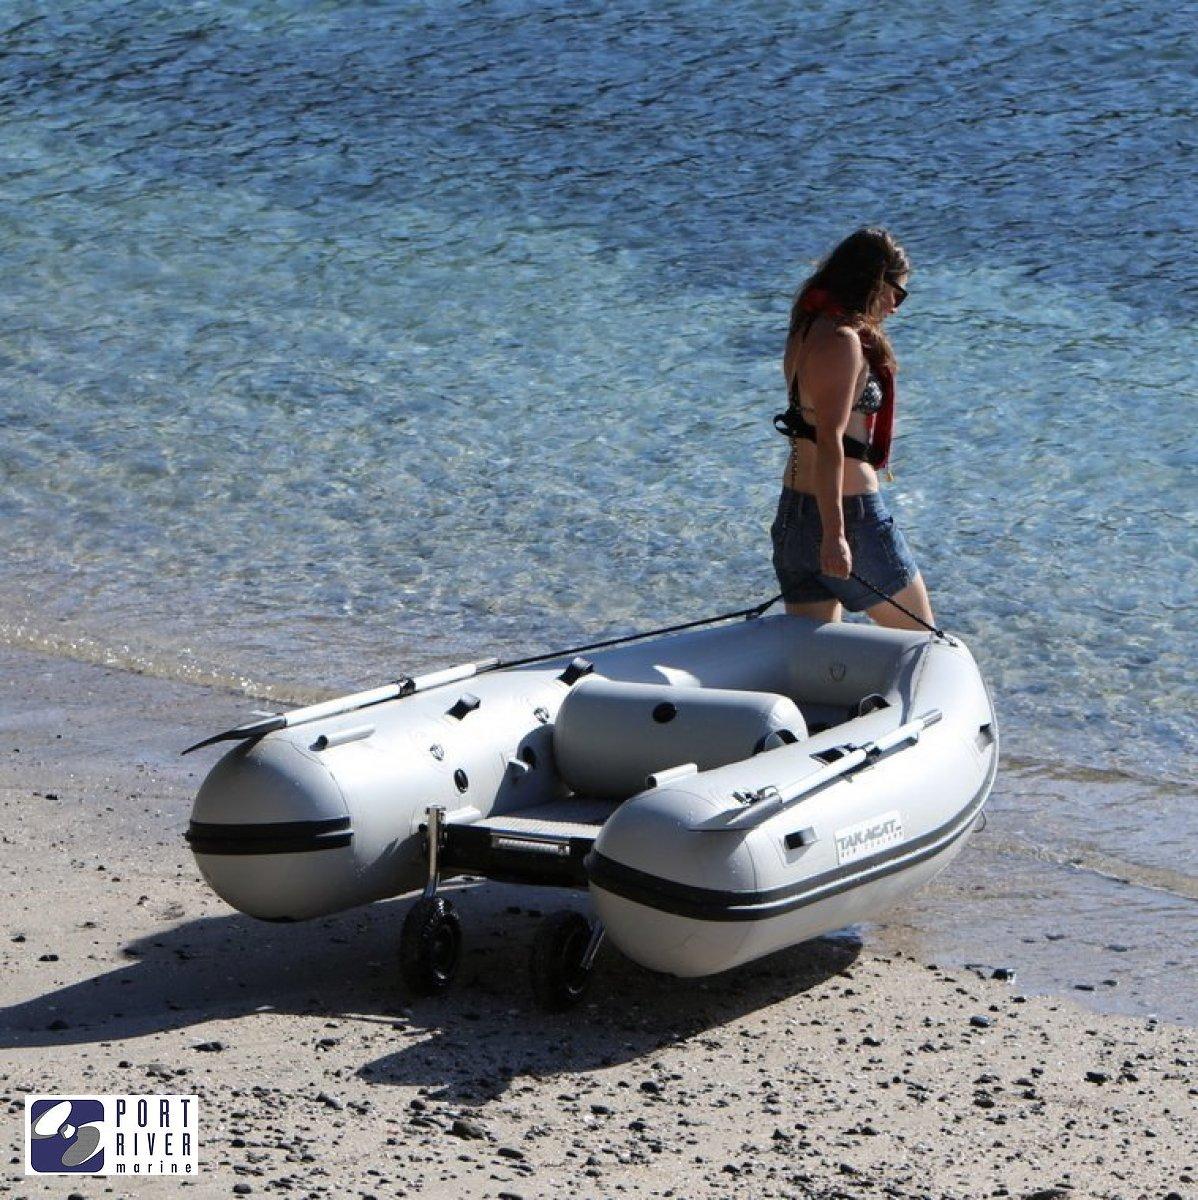 Takacat 260S | Port River Marine Services